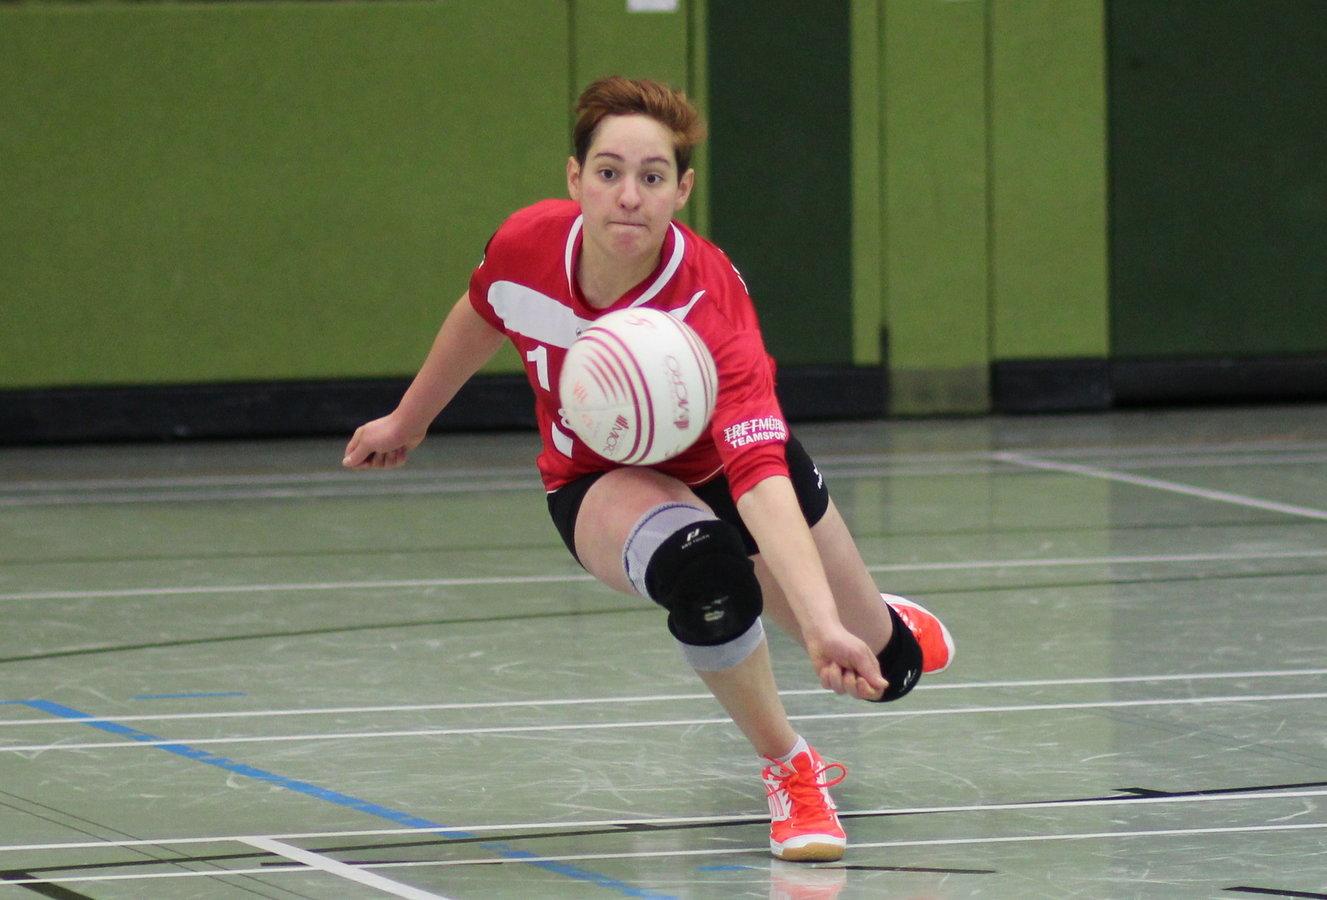 Melissa Seibert erläuft einen kurz geschlagenen Ball